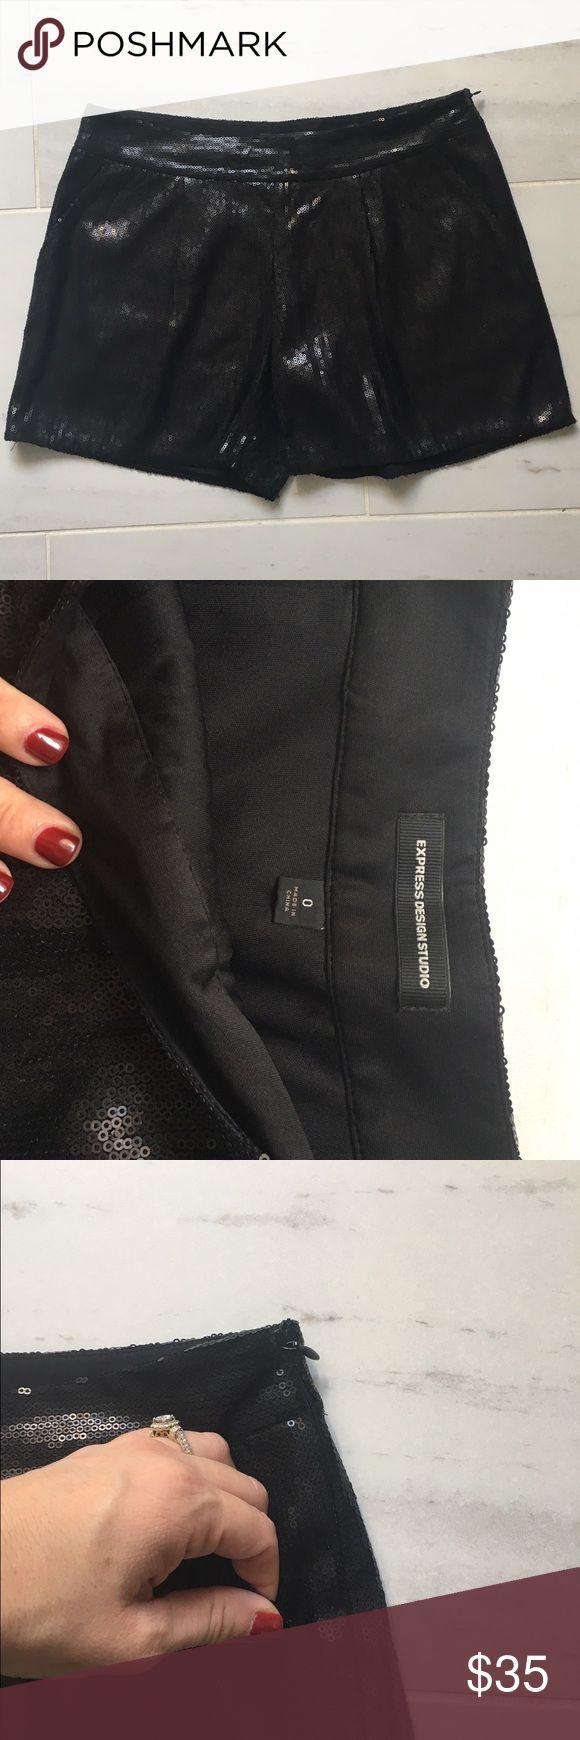 black sequin shorts express sequined shorts RIDXEDQ